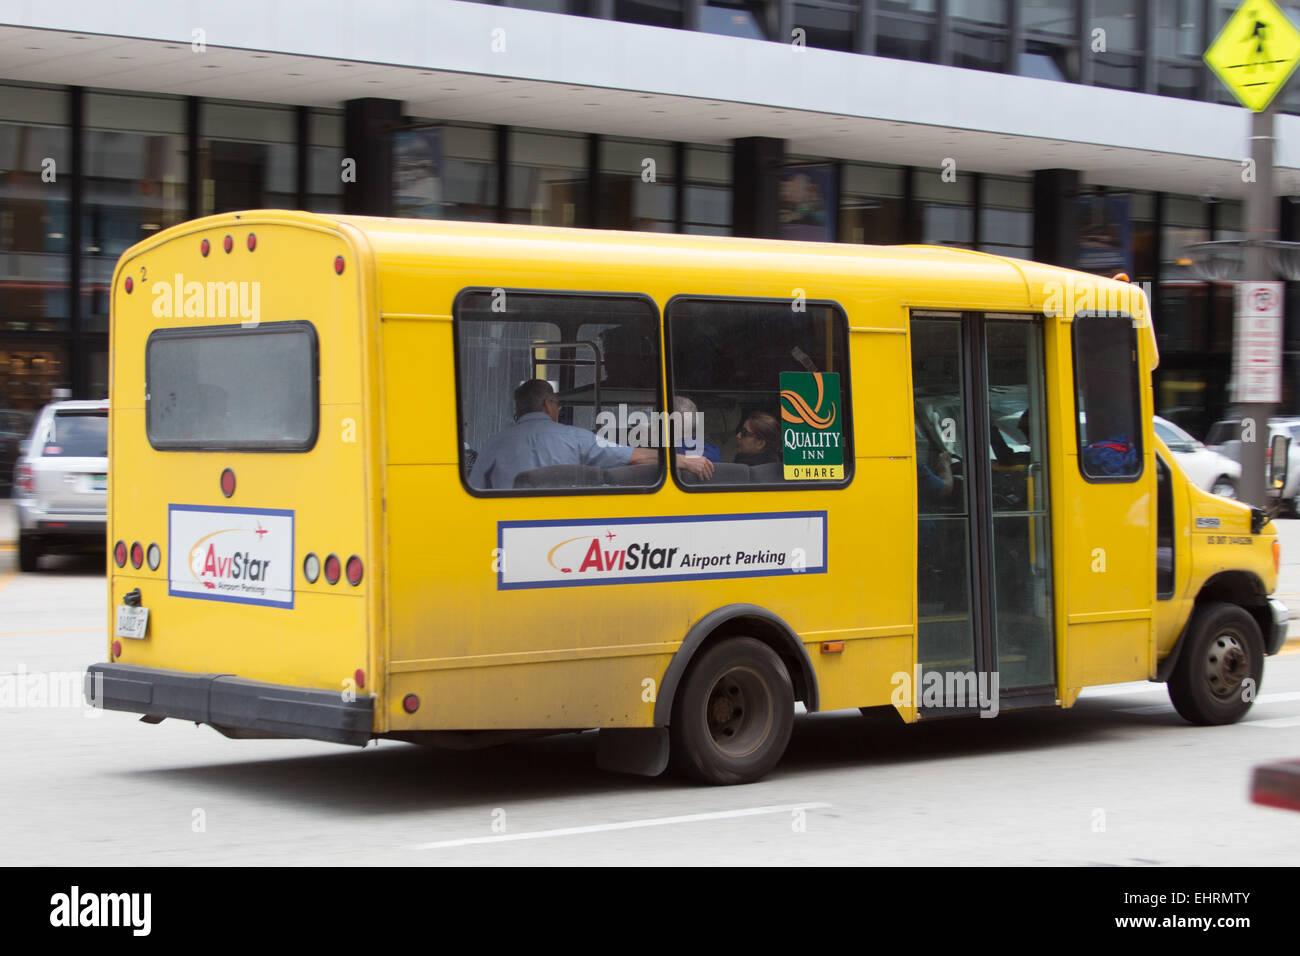 Avistar Airport Parking Shuttle Bus Stock Image